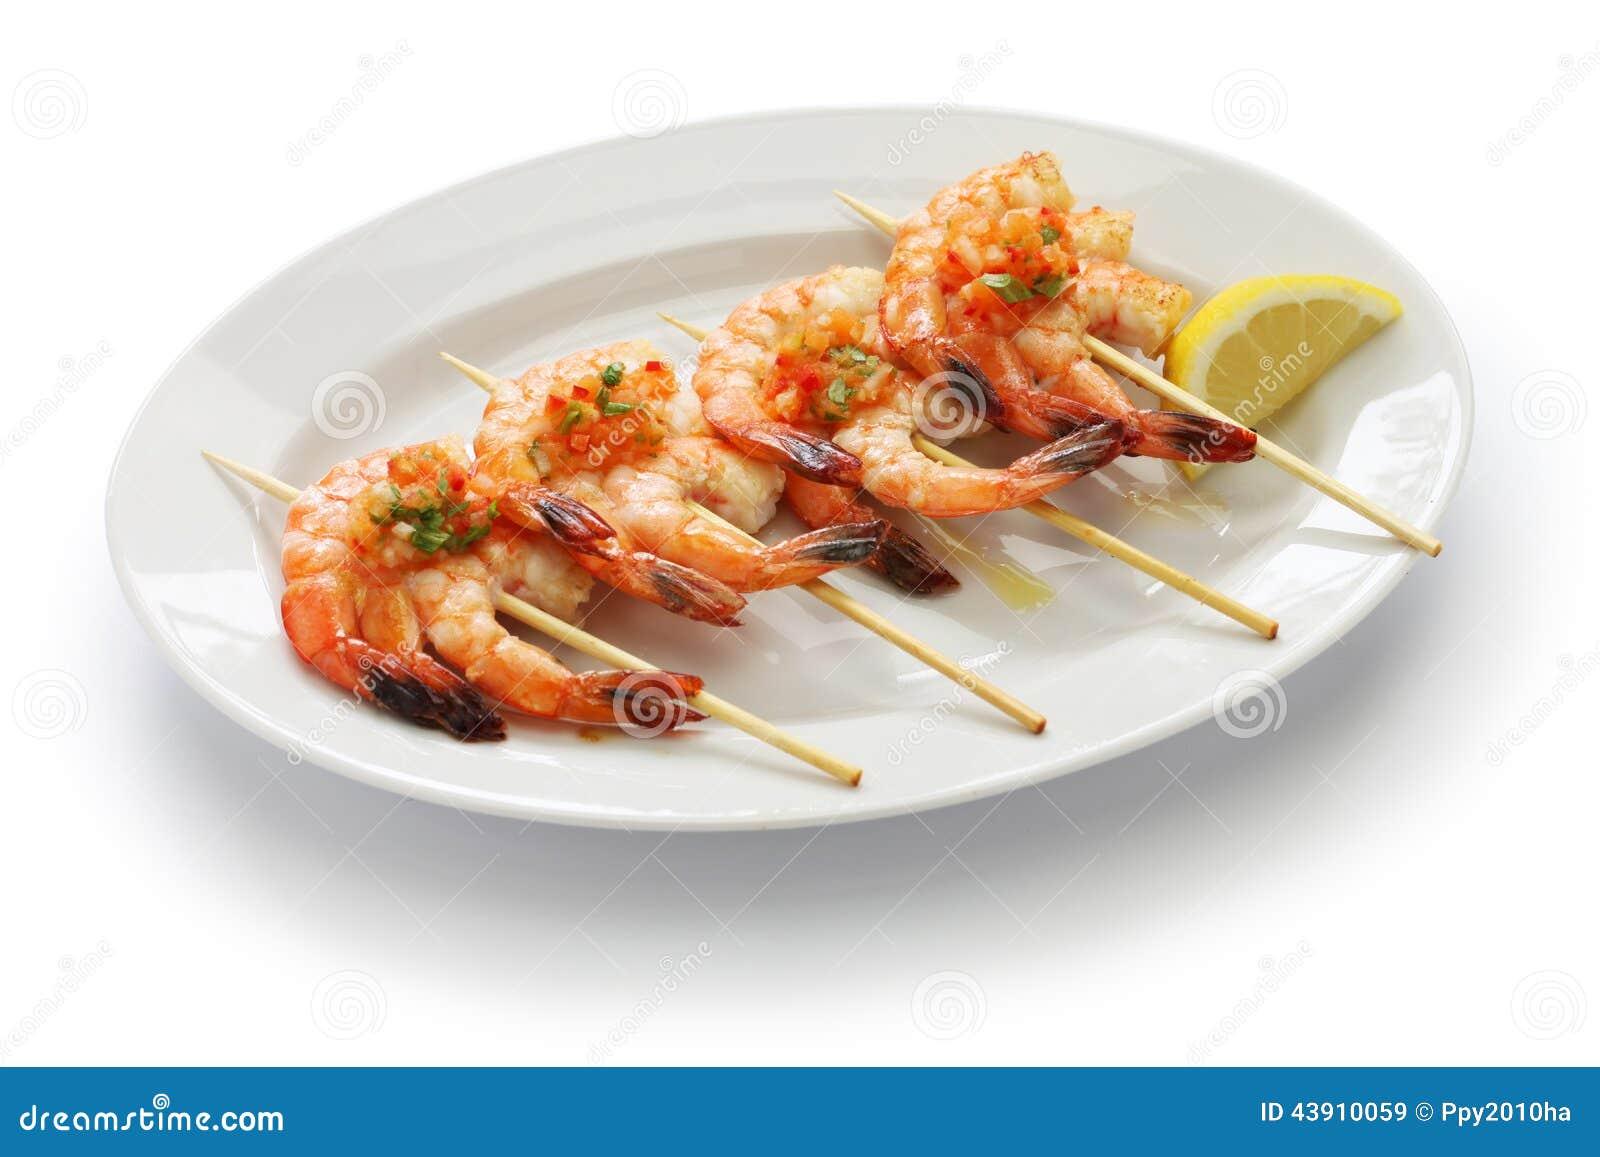 Brochetas de gambas spanish grilled shrimp skewers stock for Brochetas de gambas